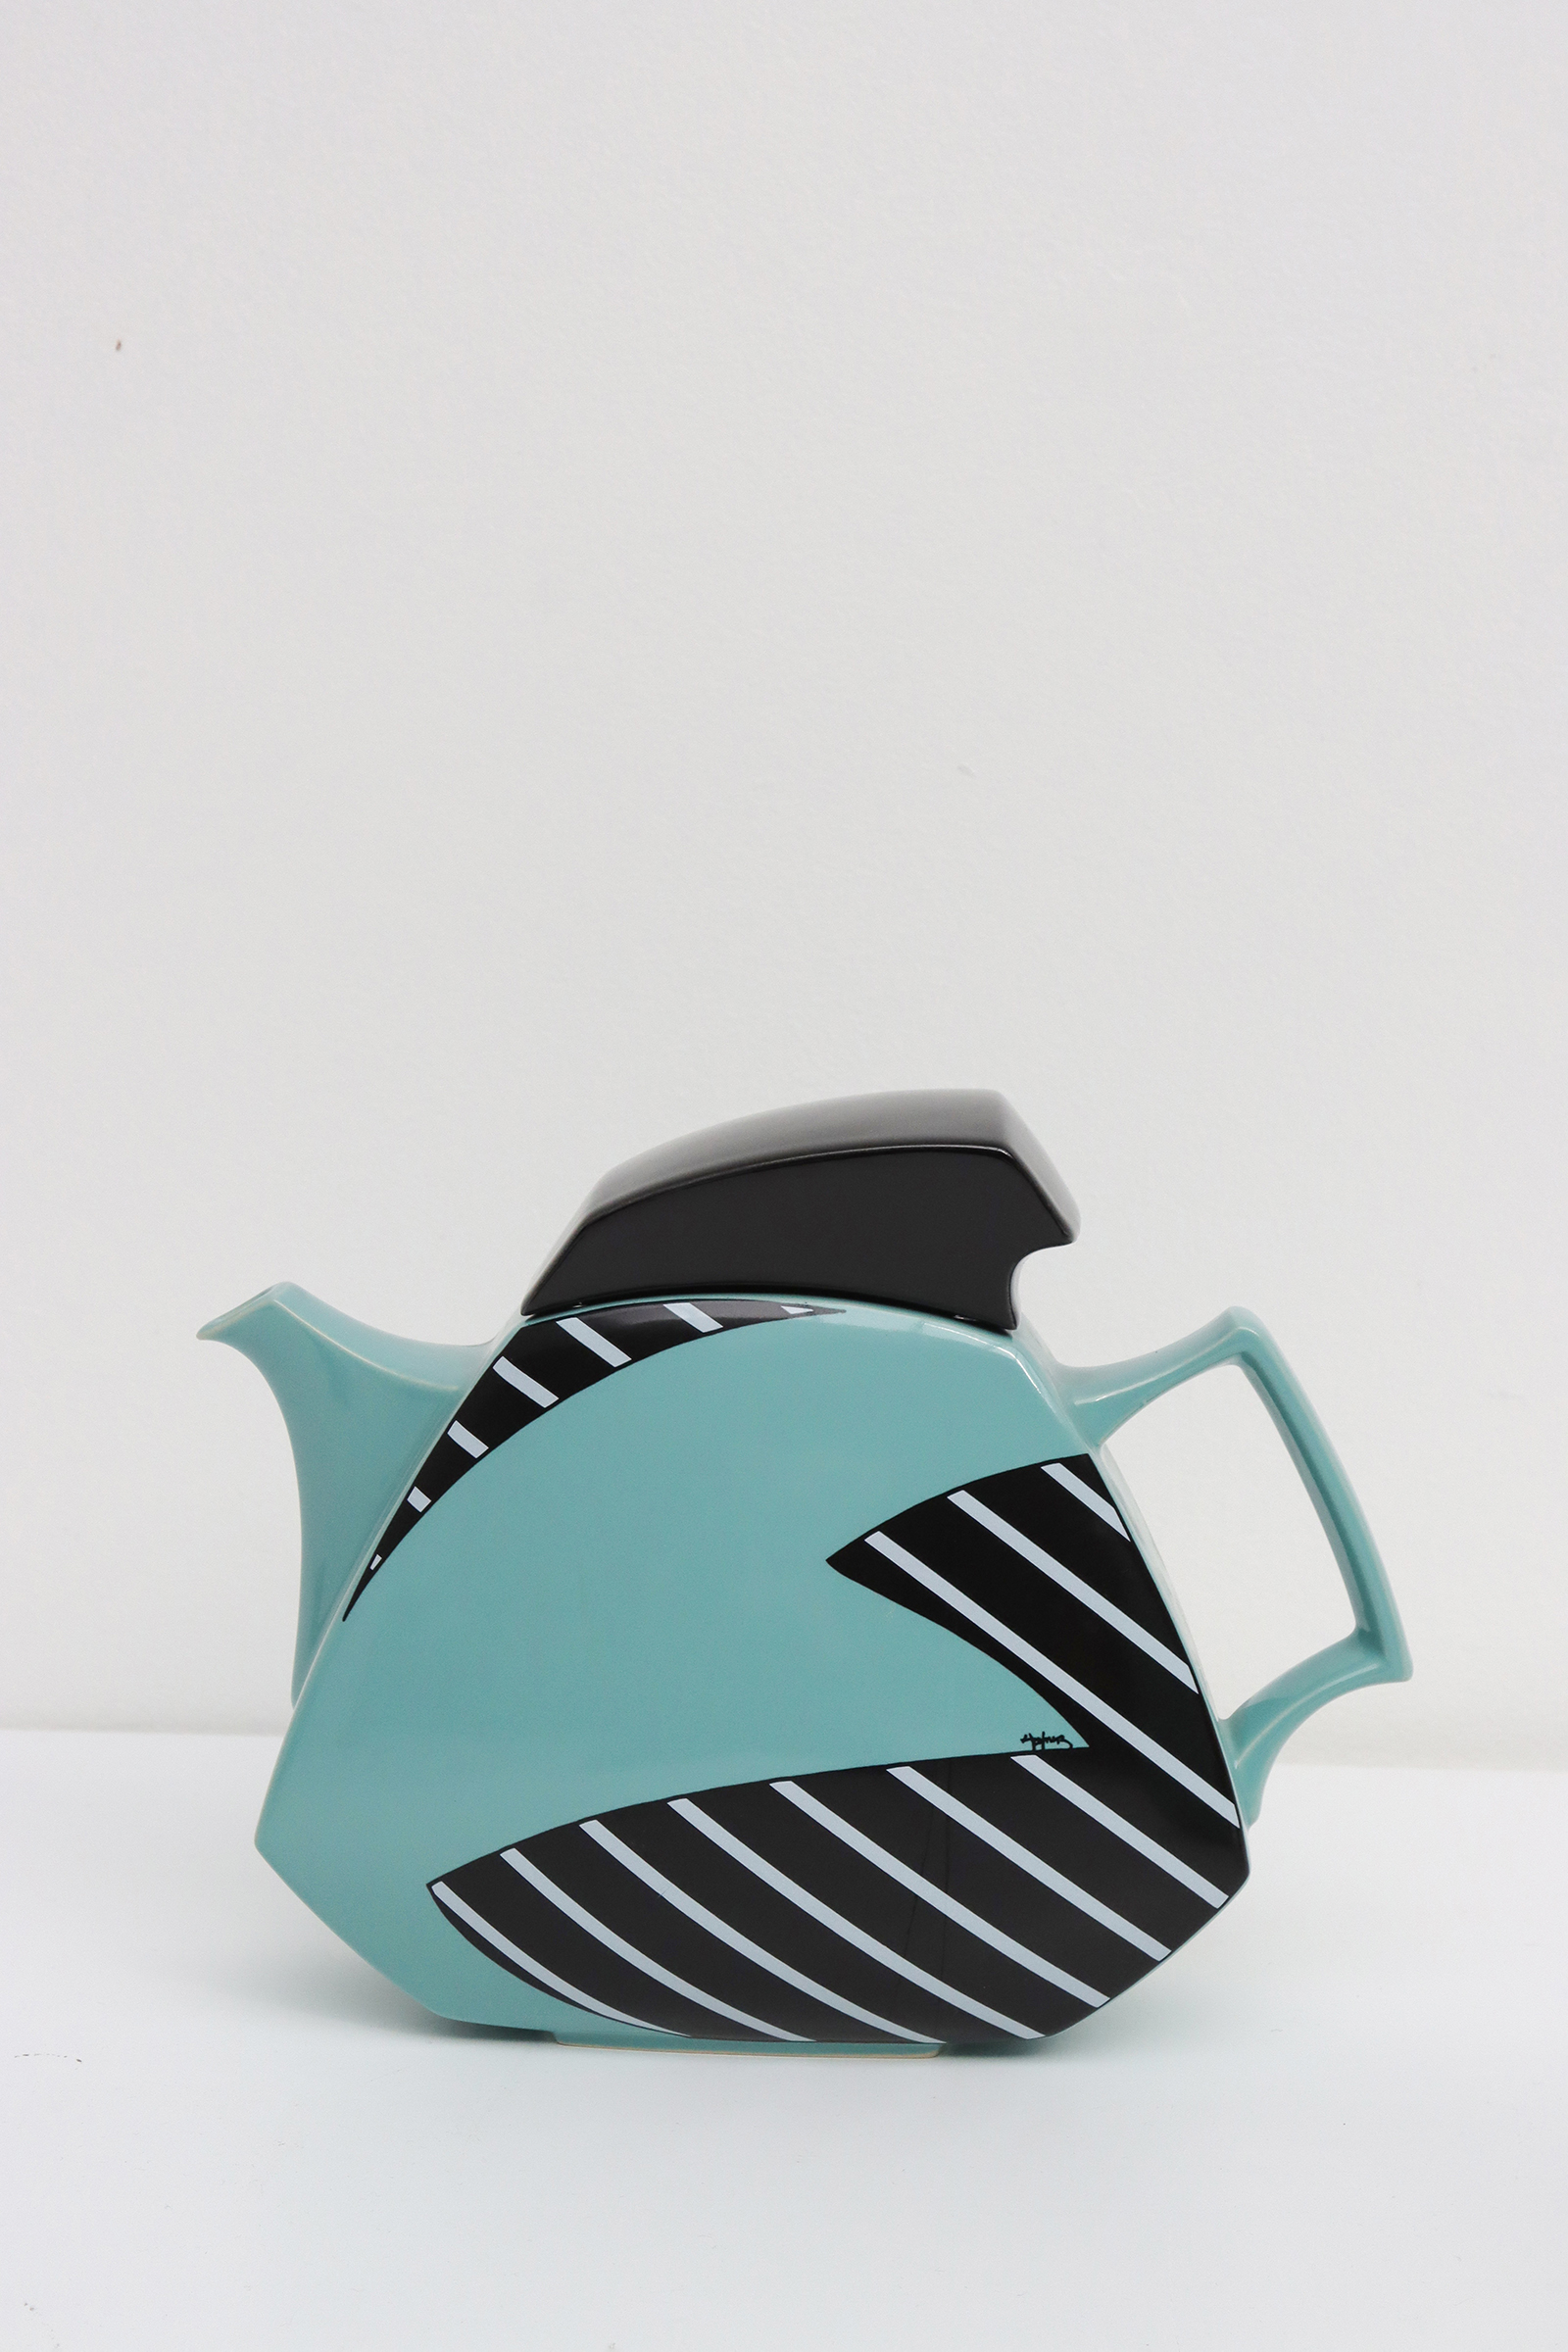 Flash Coffee and tea set by Dorothy Hafner for Rosenthalimage 2